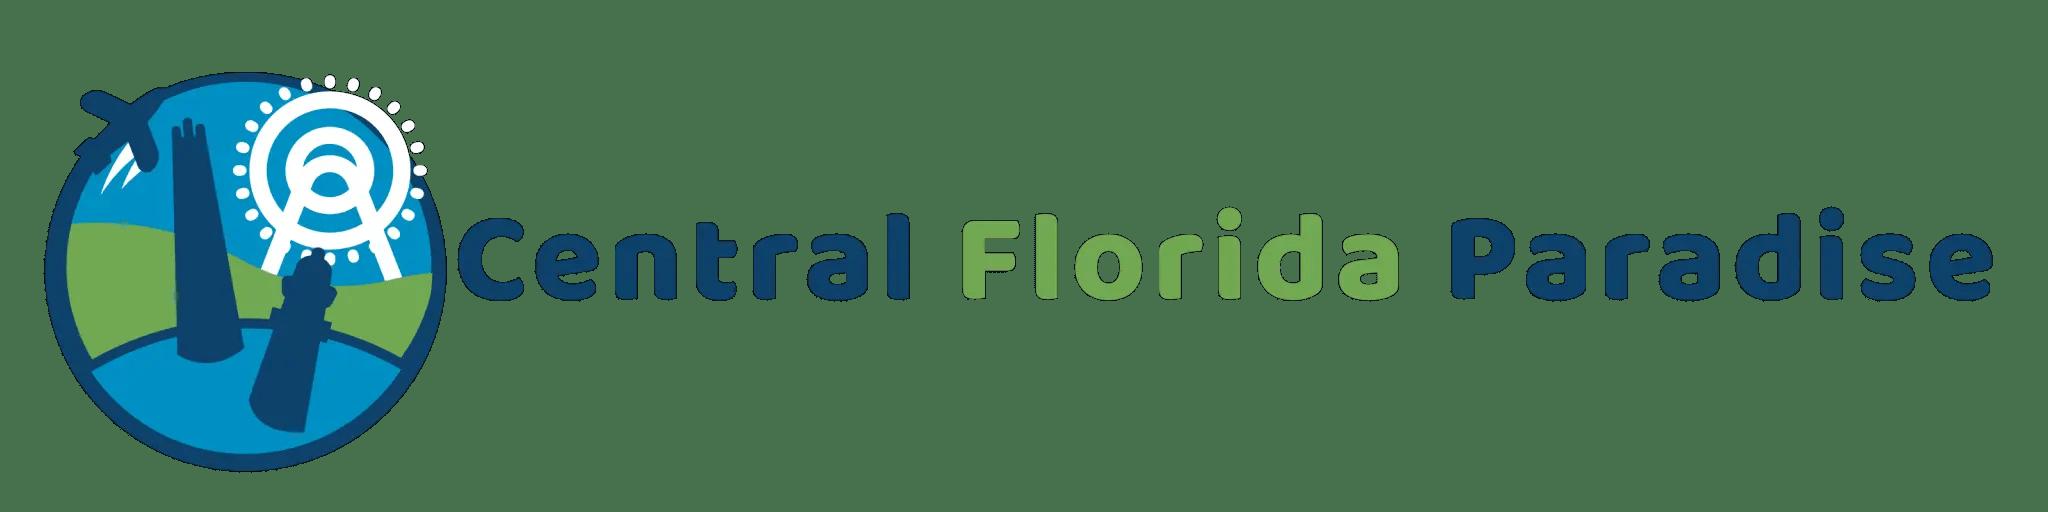 Central Florida Paradise